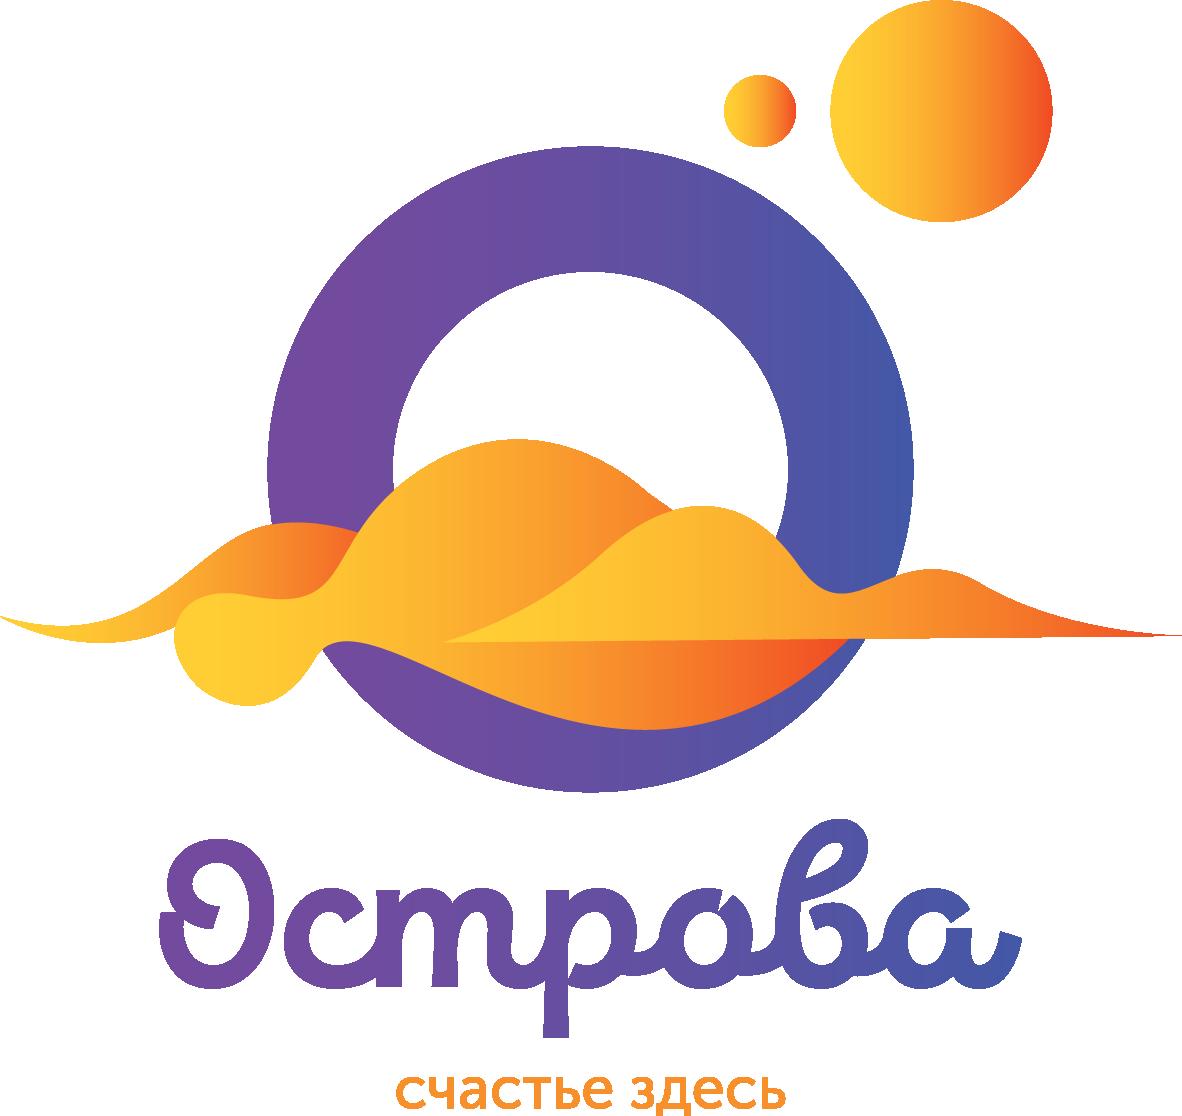 Острова логотип